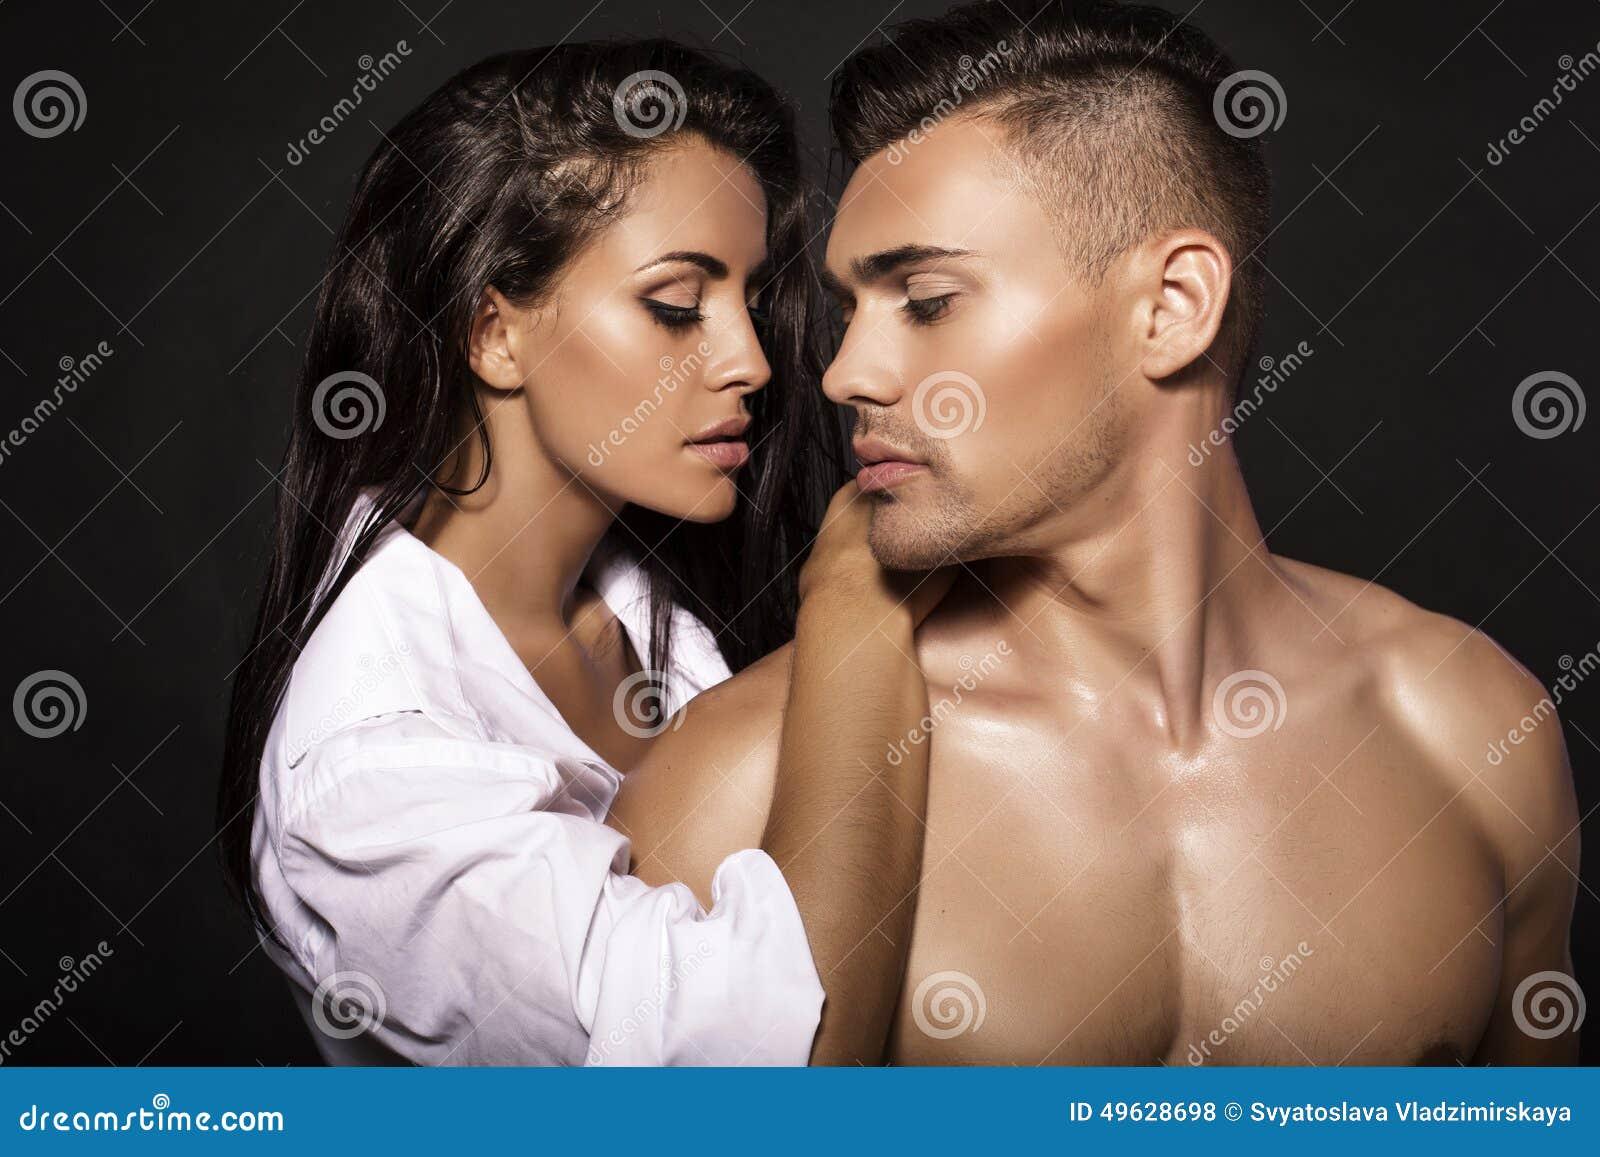 Manierfoto van sexy gloedvol paar